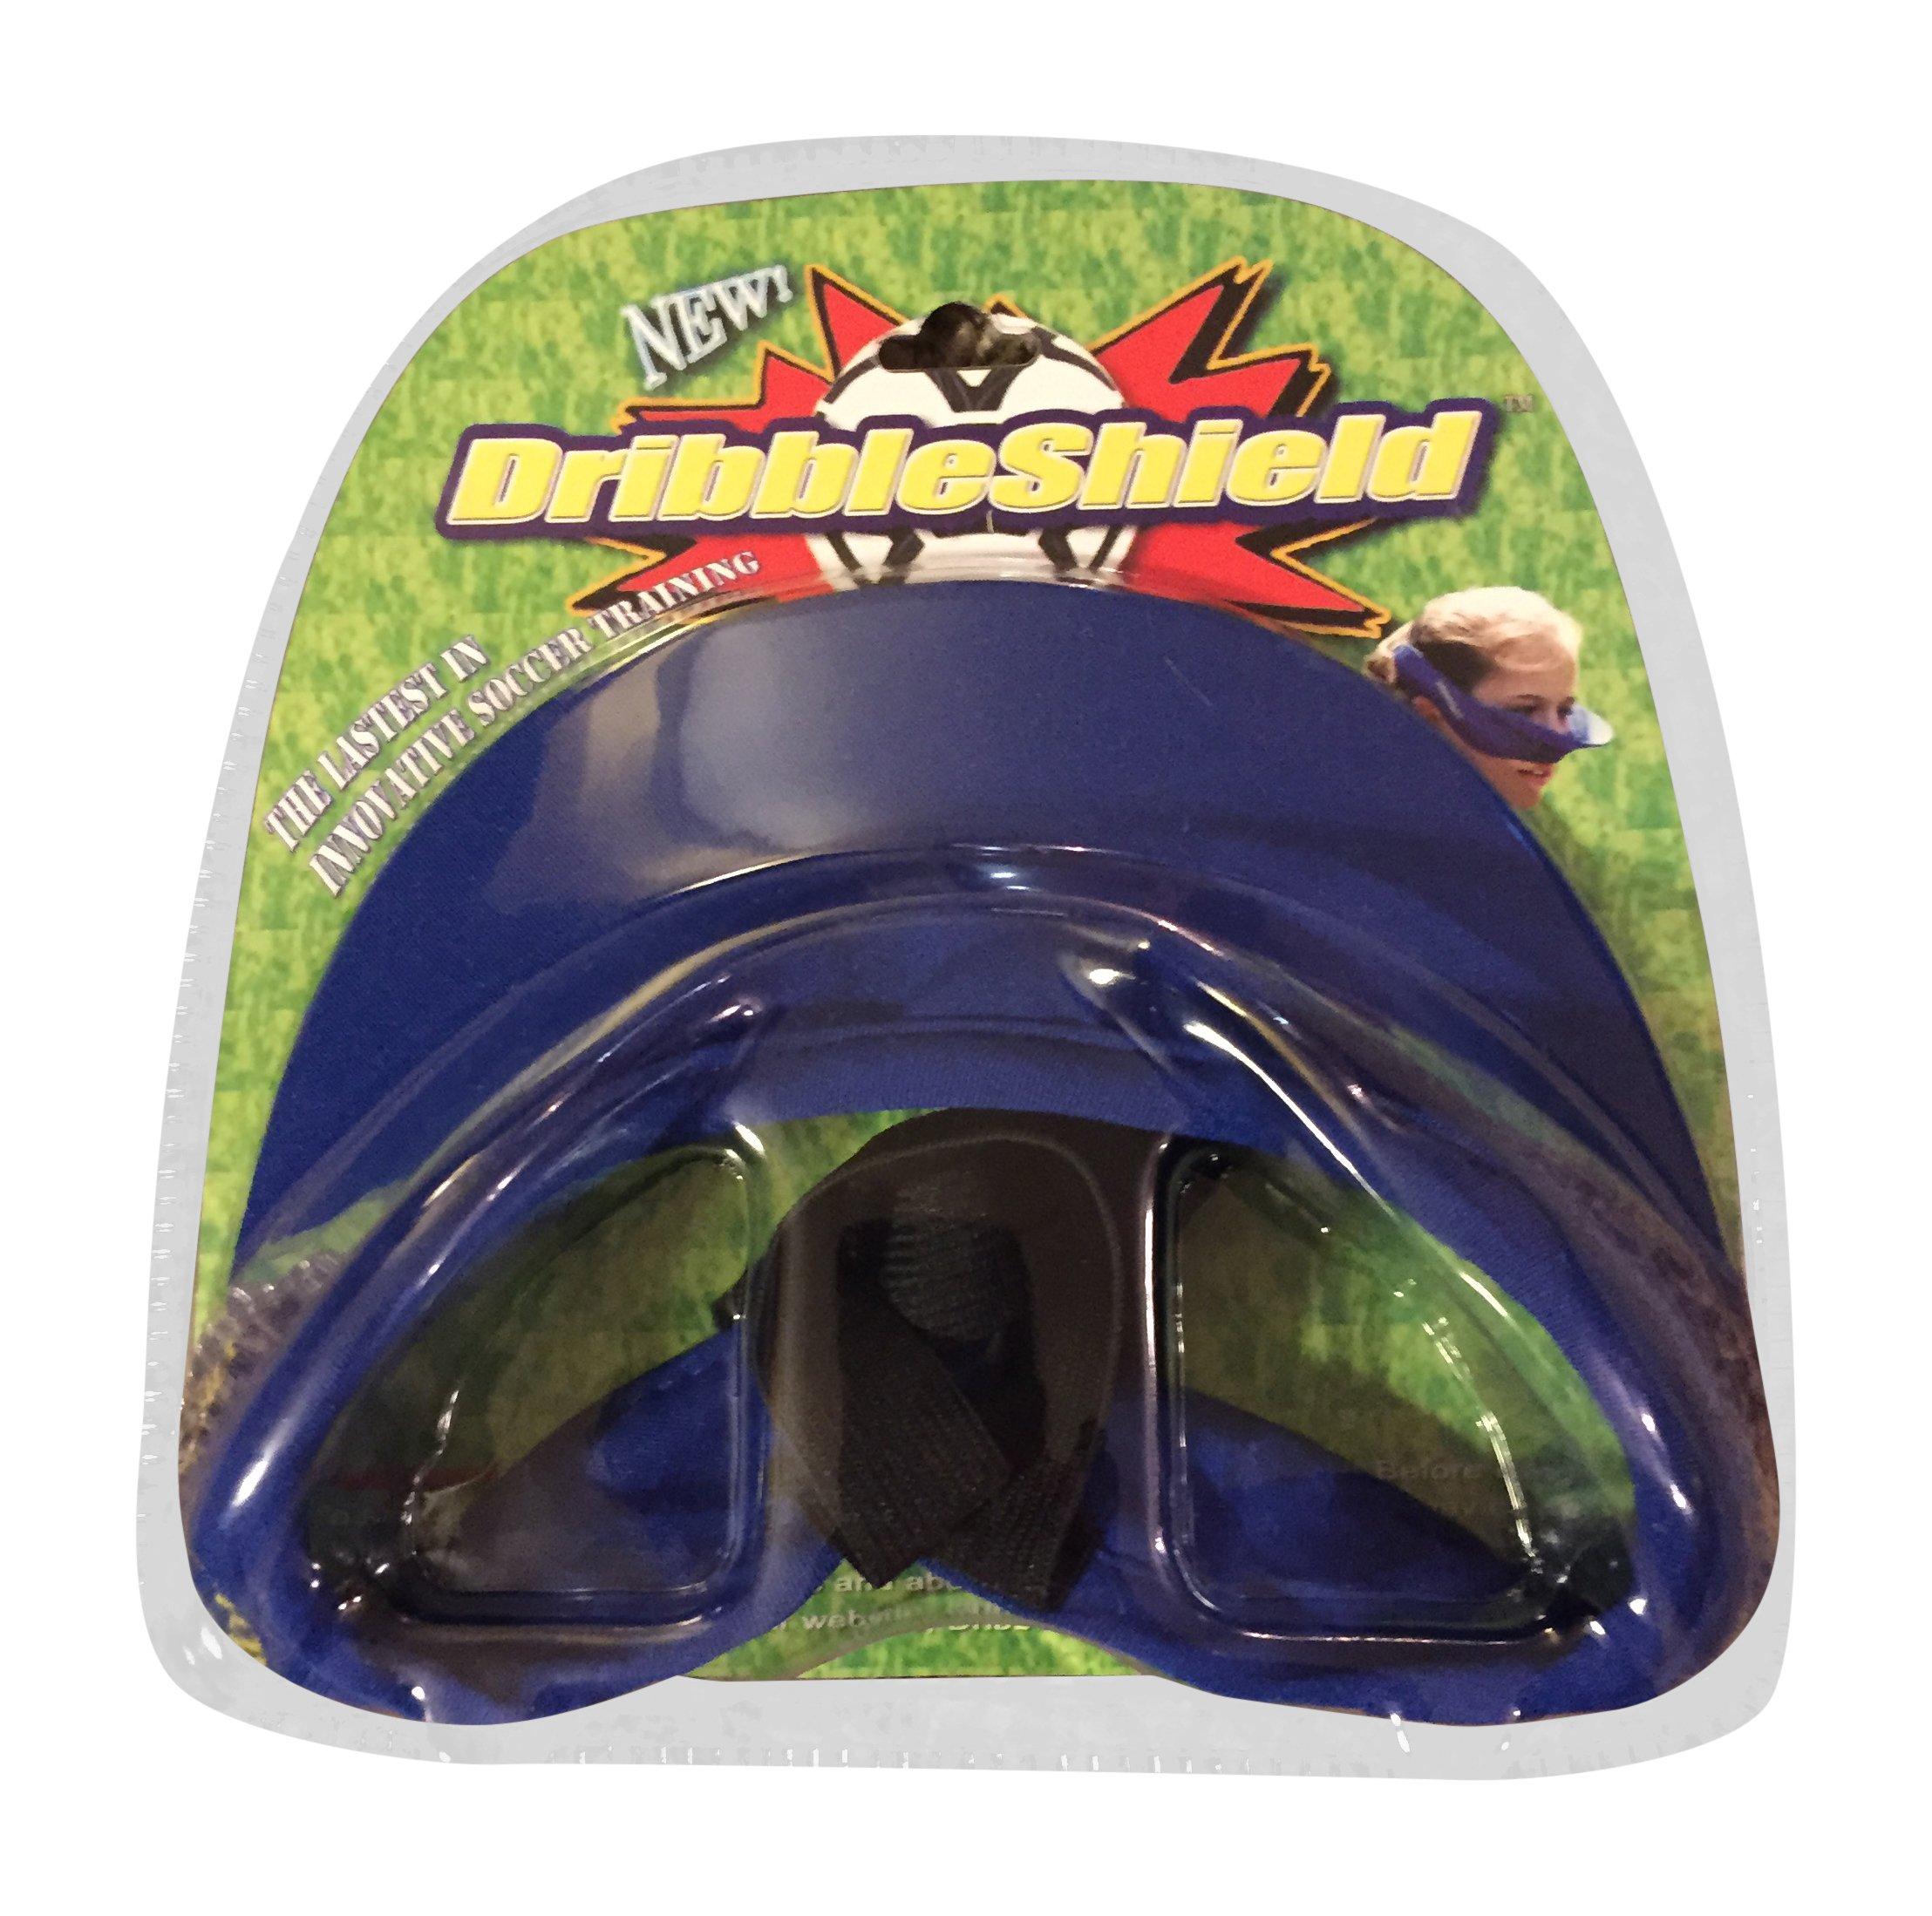 fd9bd2329718 Get Quotations · Soccer Dribble Shield (DribbleShield™)